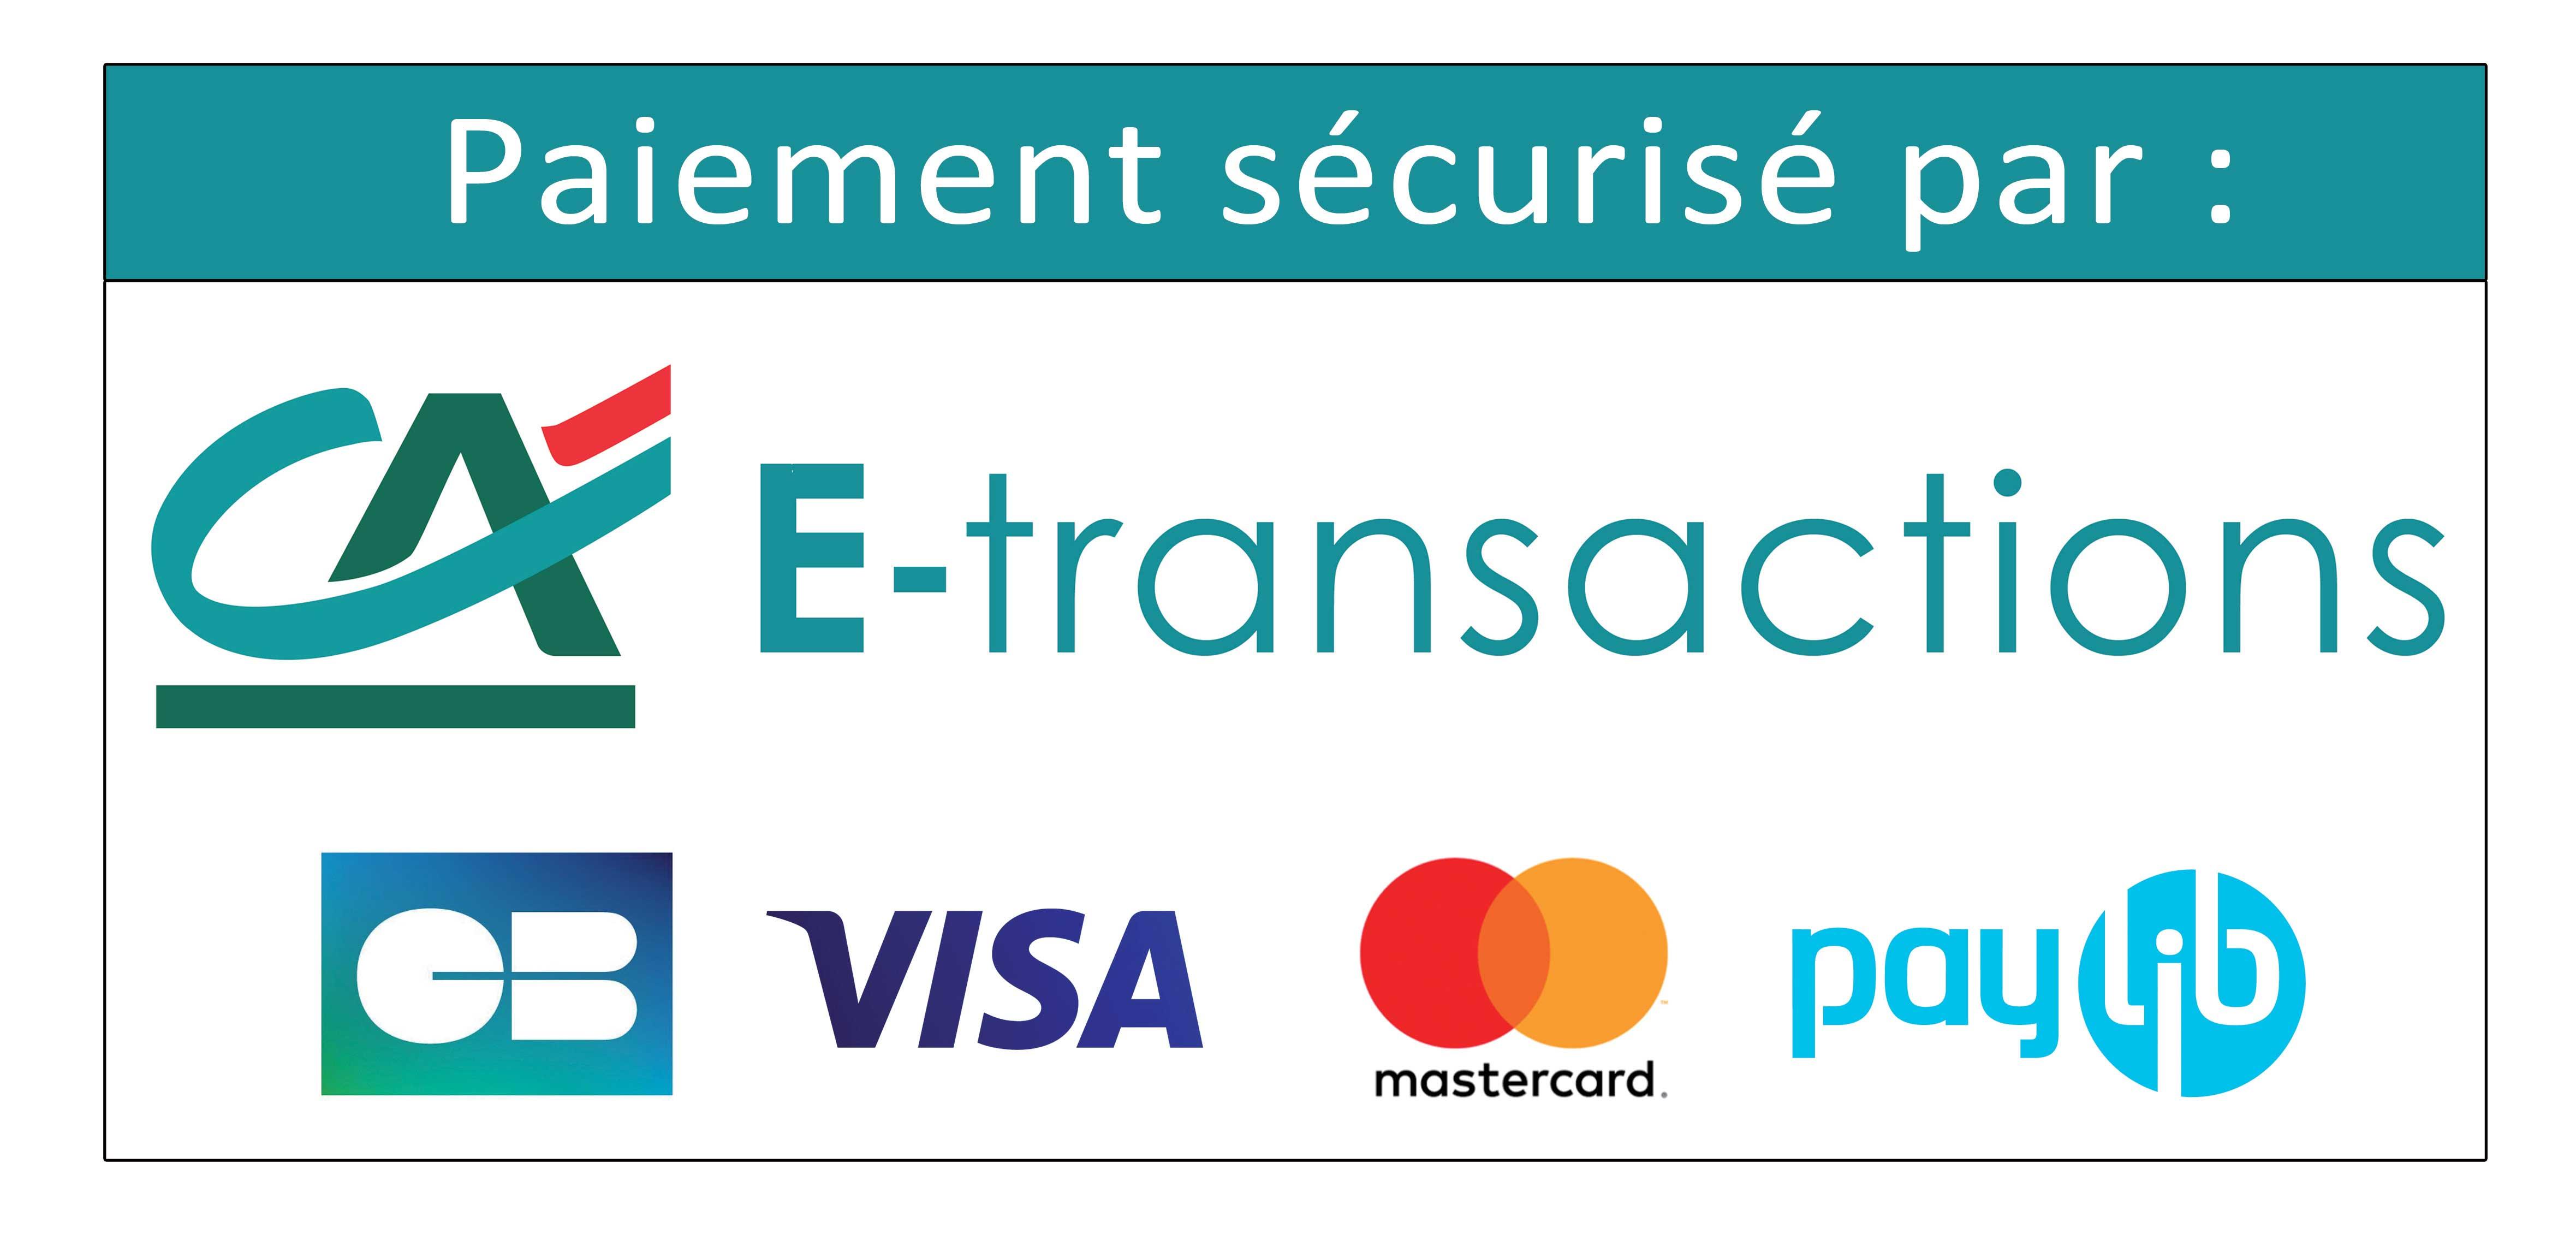 ca-e-transactions-cb-visa-mastercard-agriaus